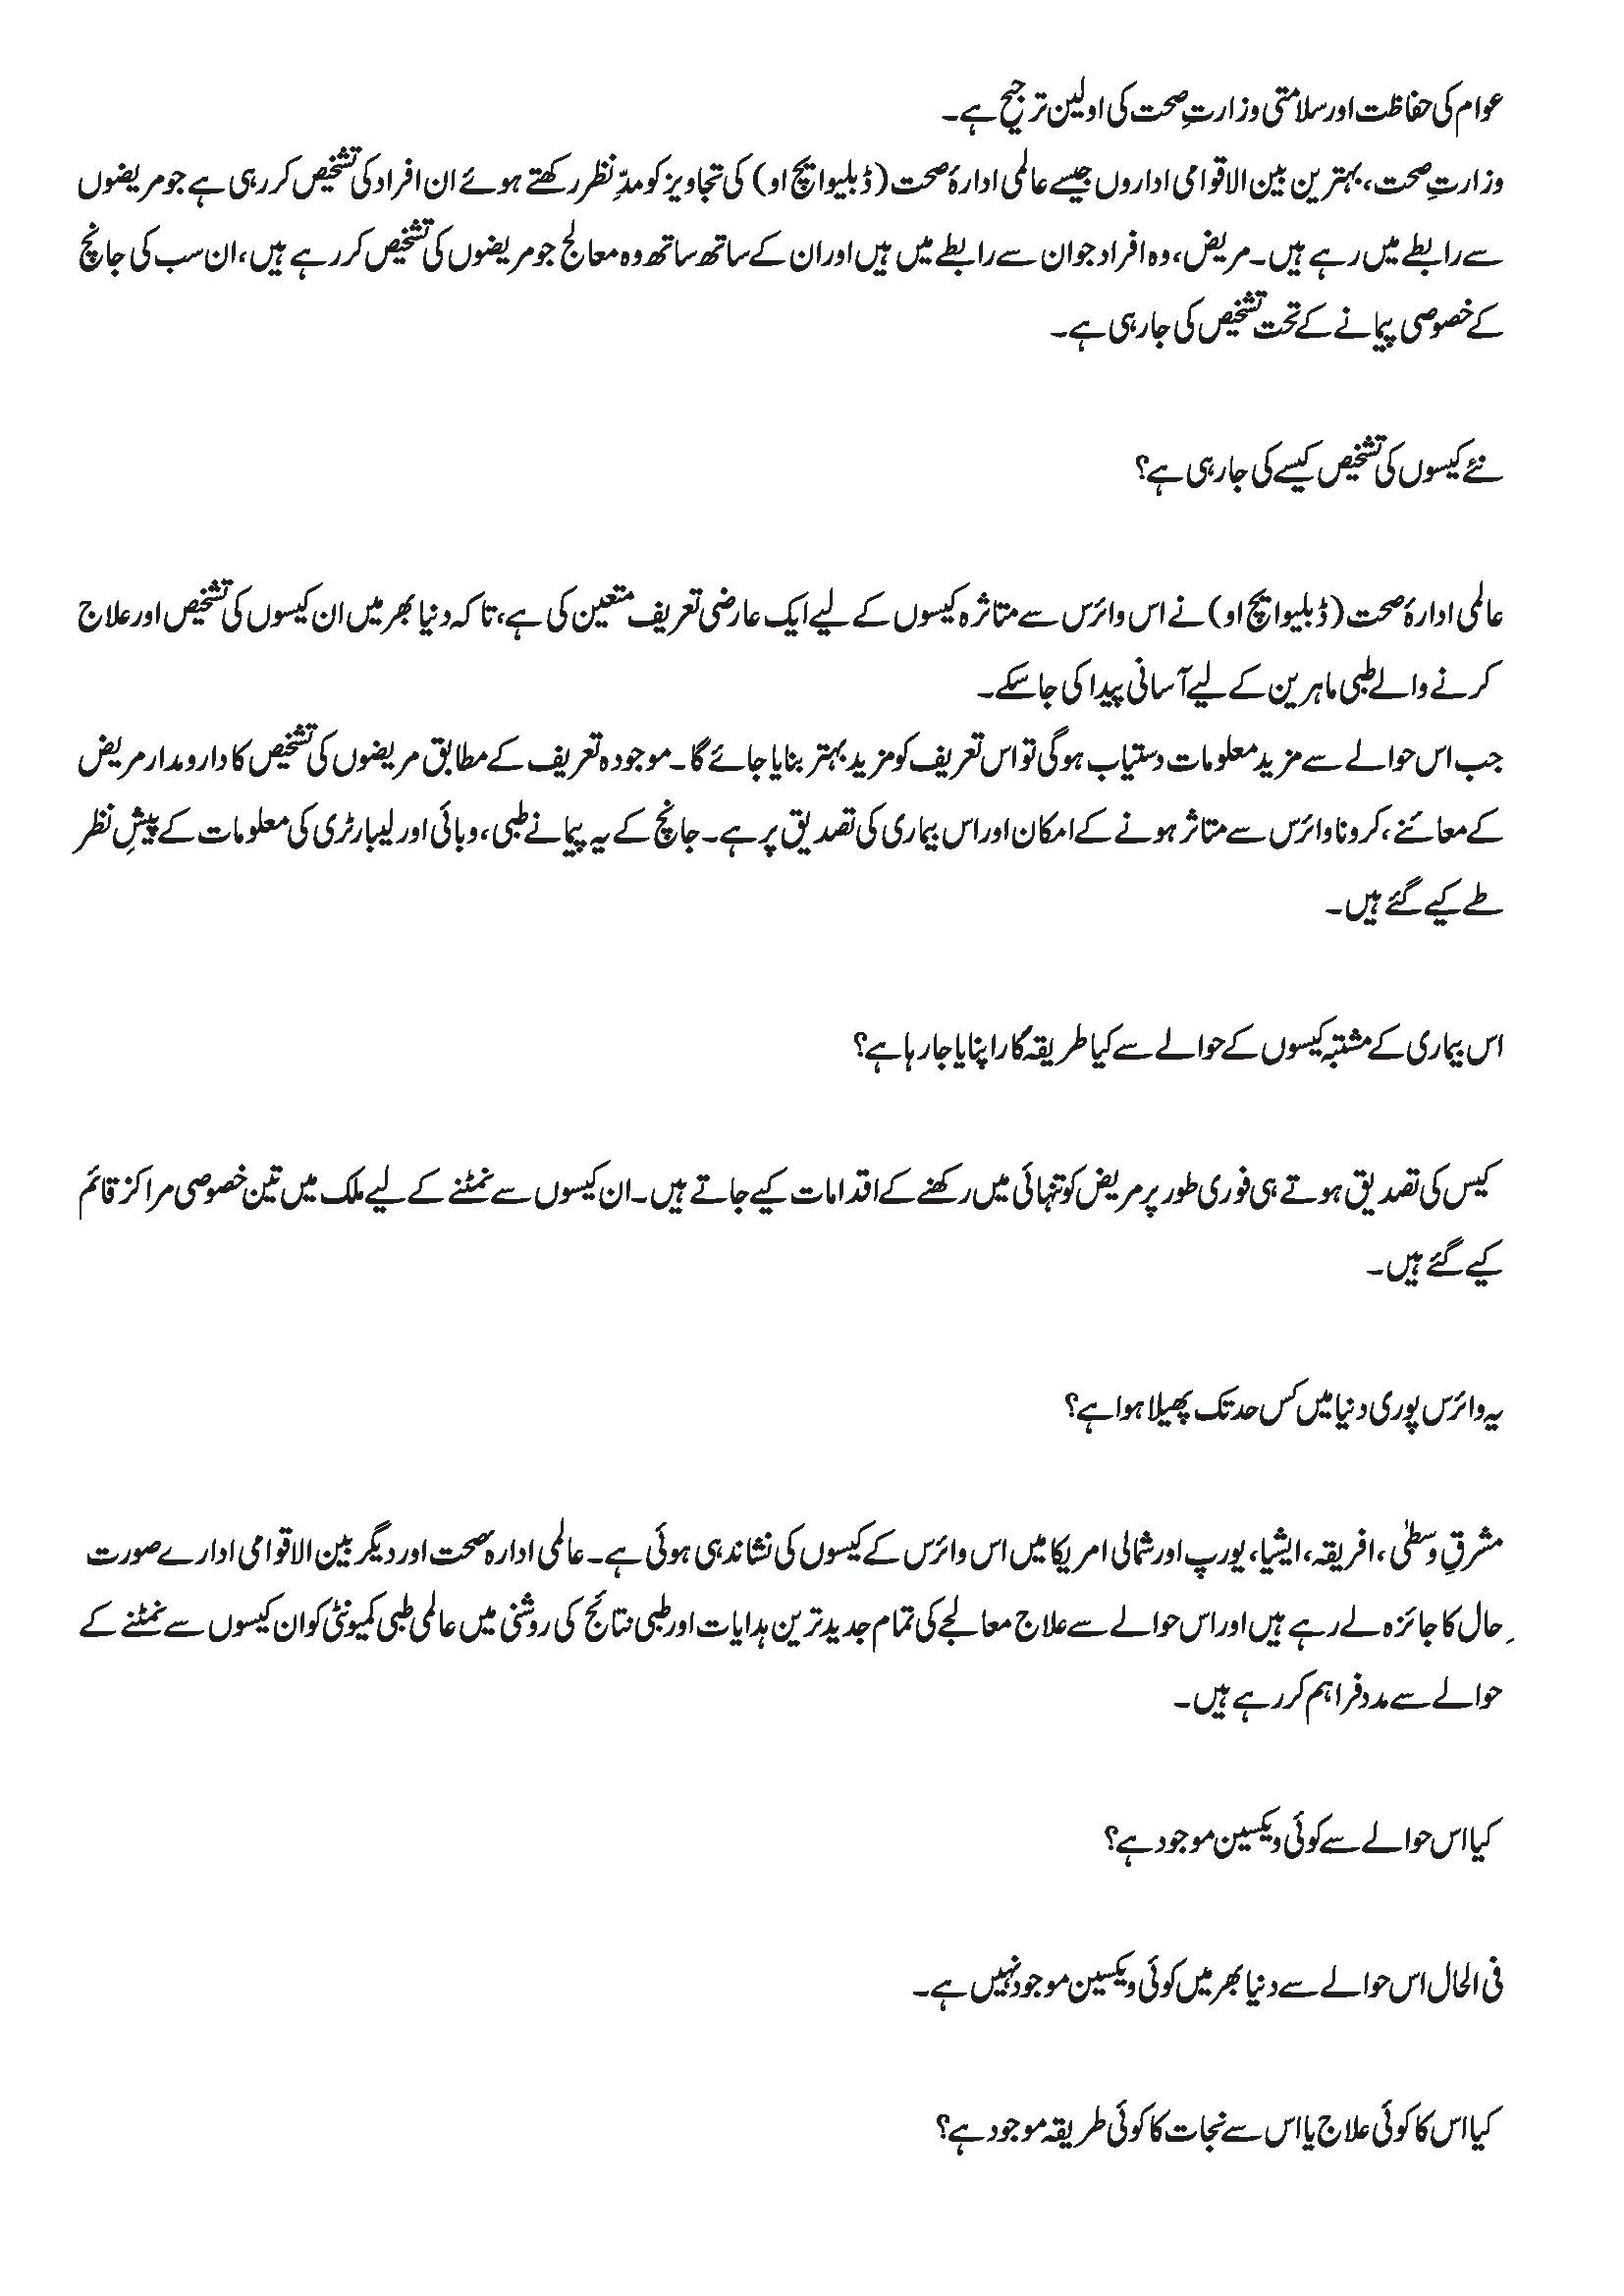 coronavirus precautions in urdu